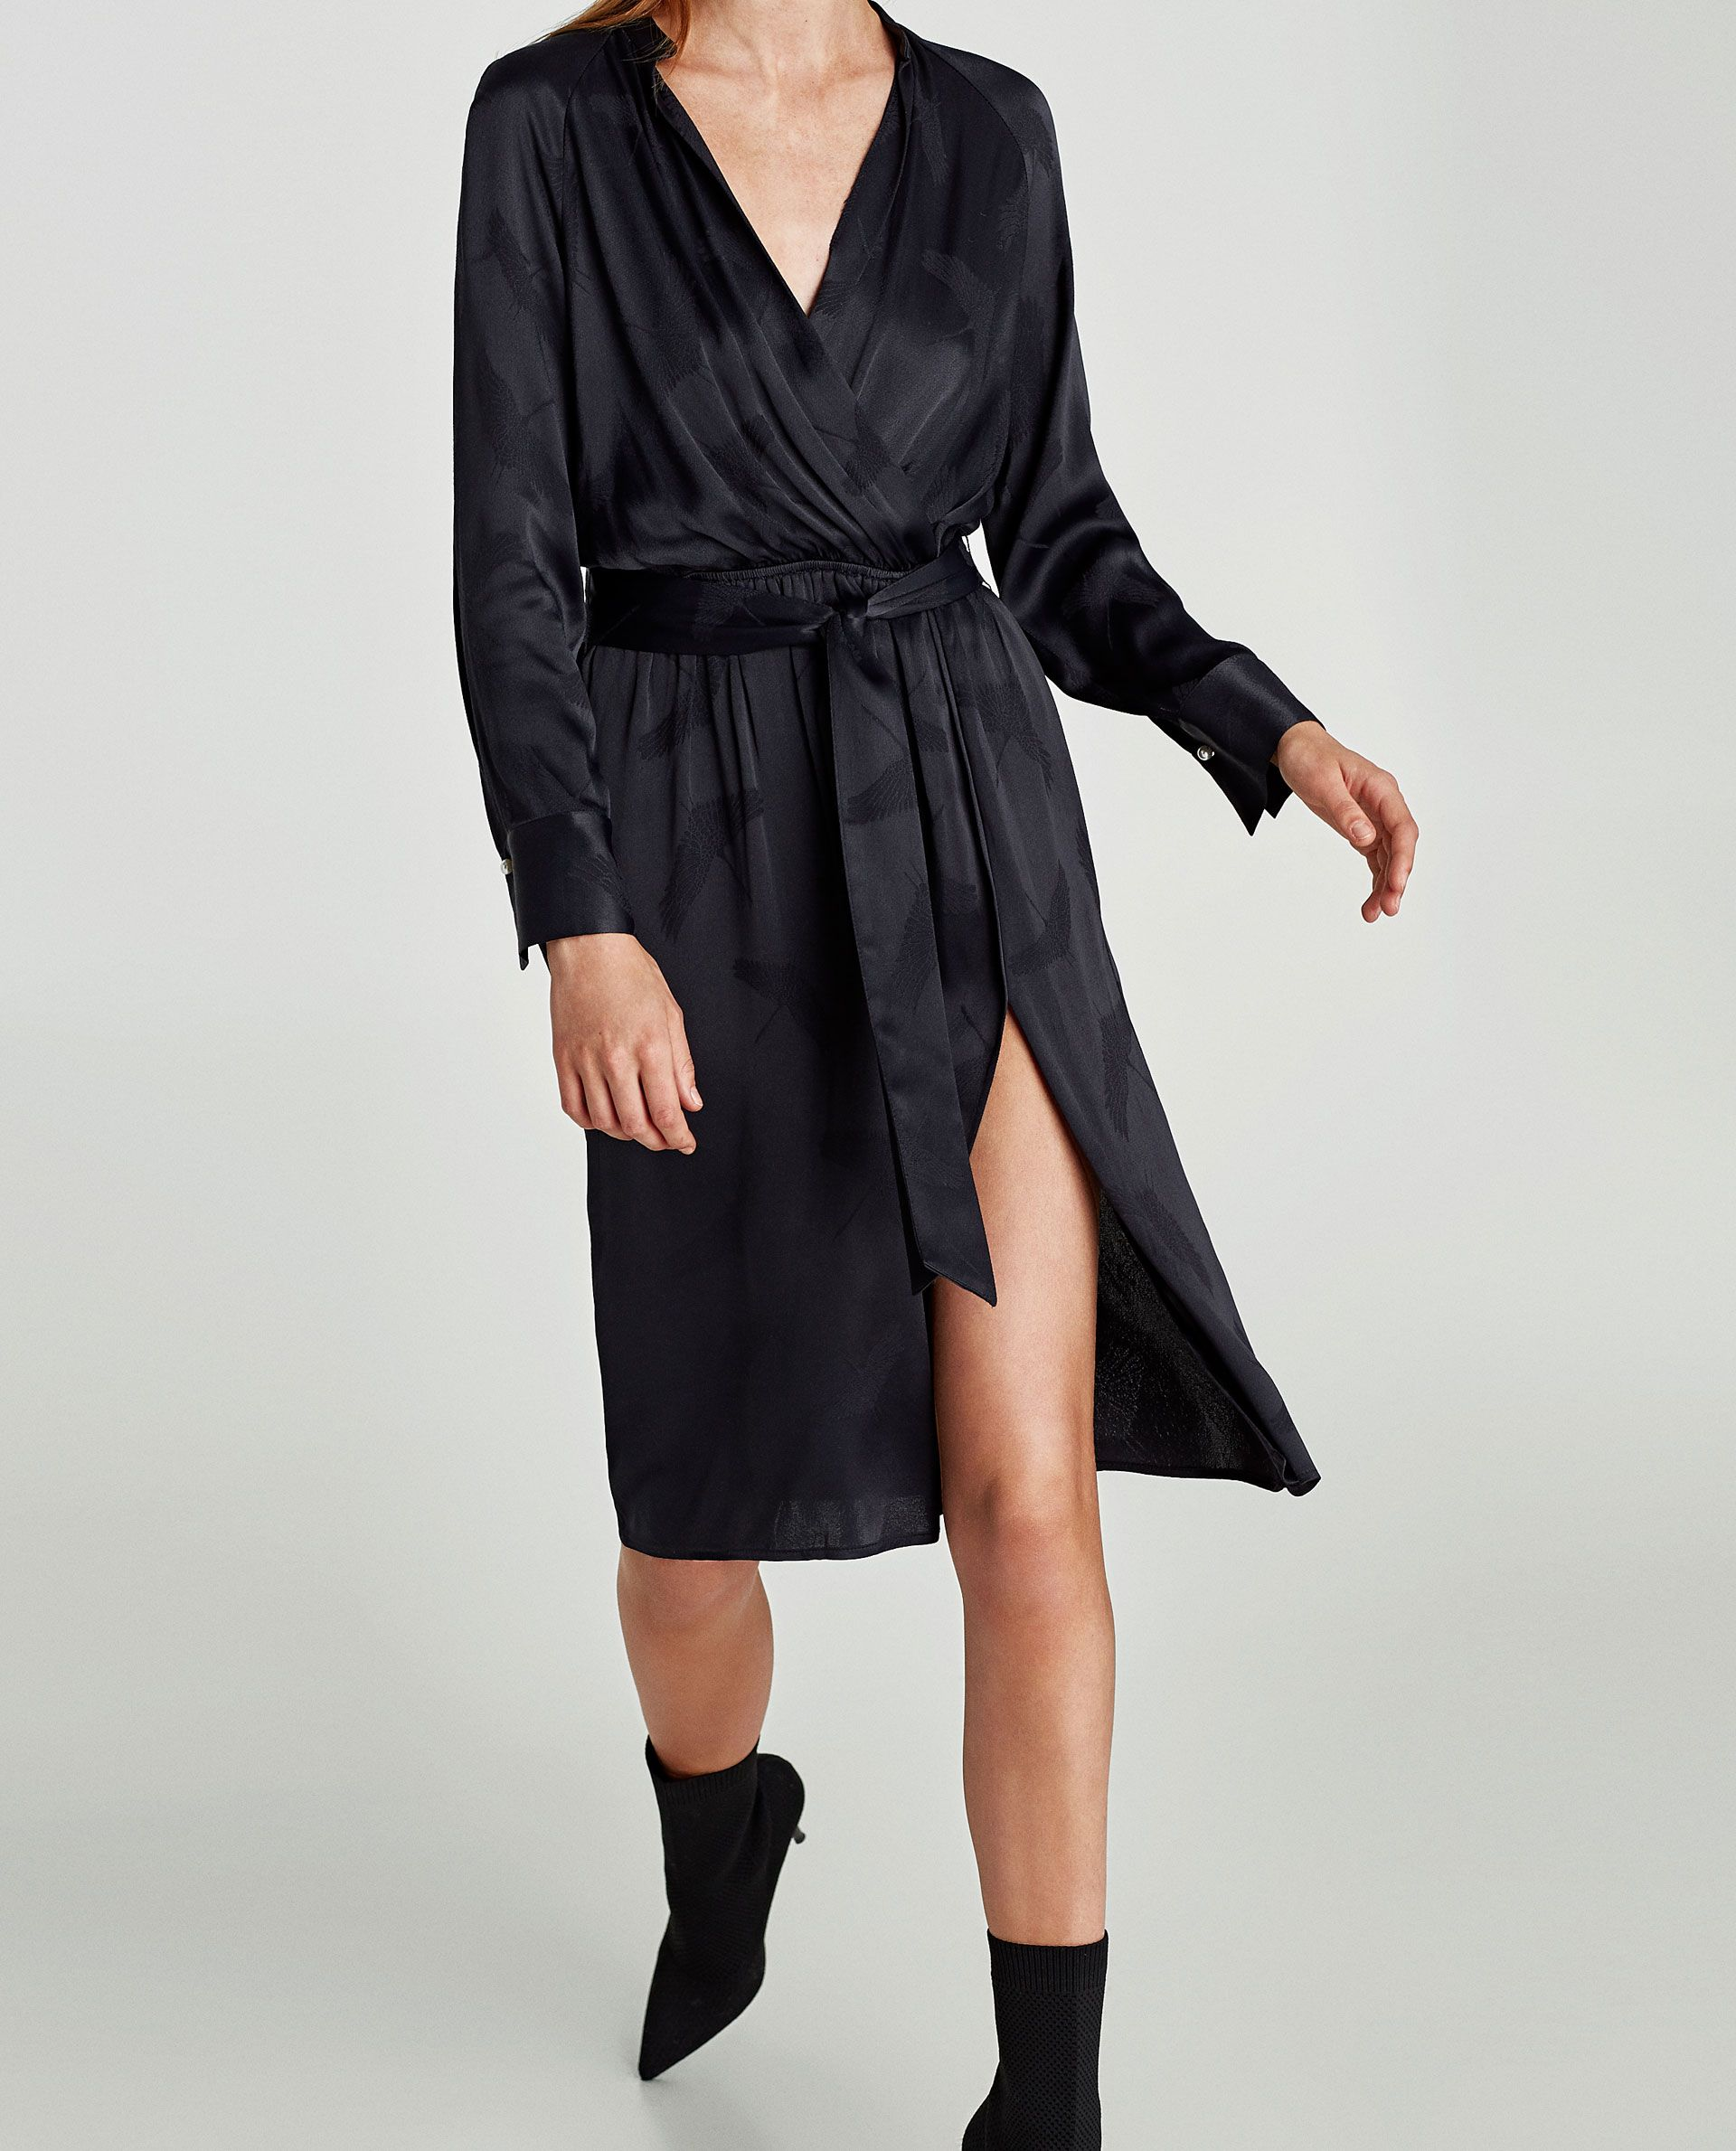 Zara Dan 5 Balikcil Desenli Jakarli Elbise Resmi Checkered Dress Jacquard Dress Clothes Design